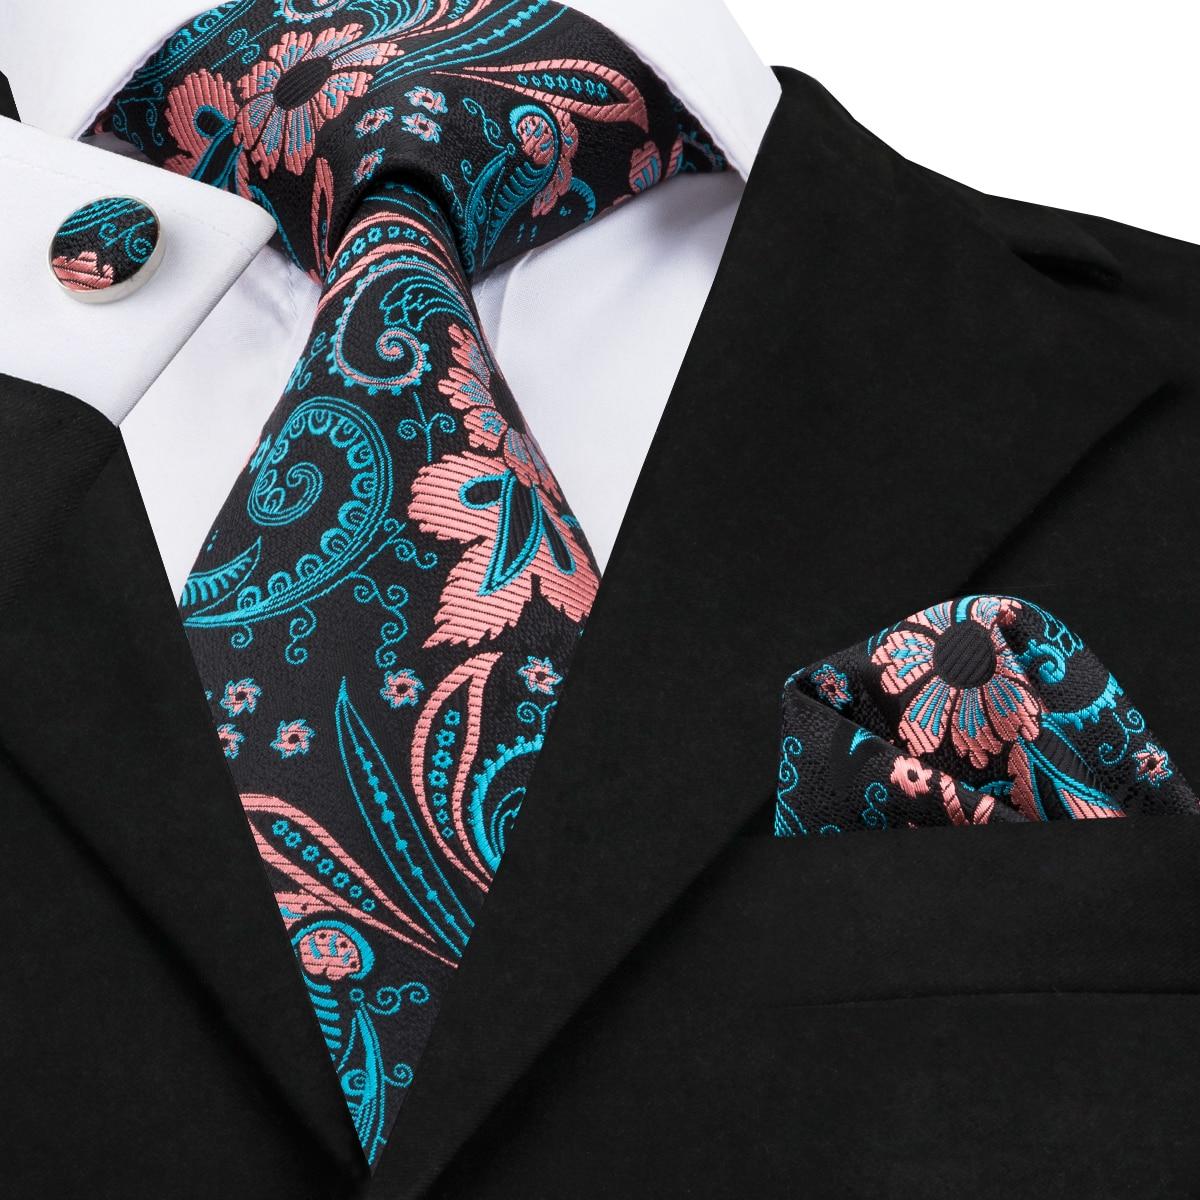 C-1689 Hi-Tie Autumn Design Paisley Ties For Men Black Blue Gravatas Necktie Hanky Cufflinks 100% Silk Jacquard Woven Corbatas